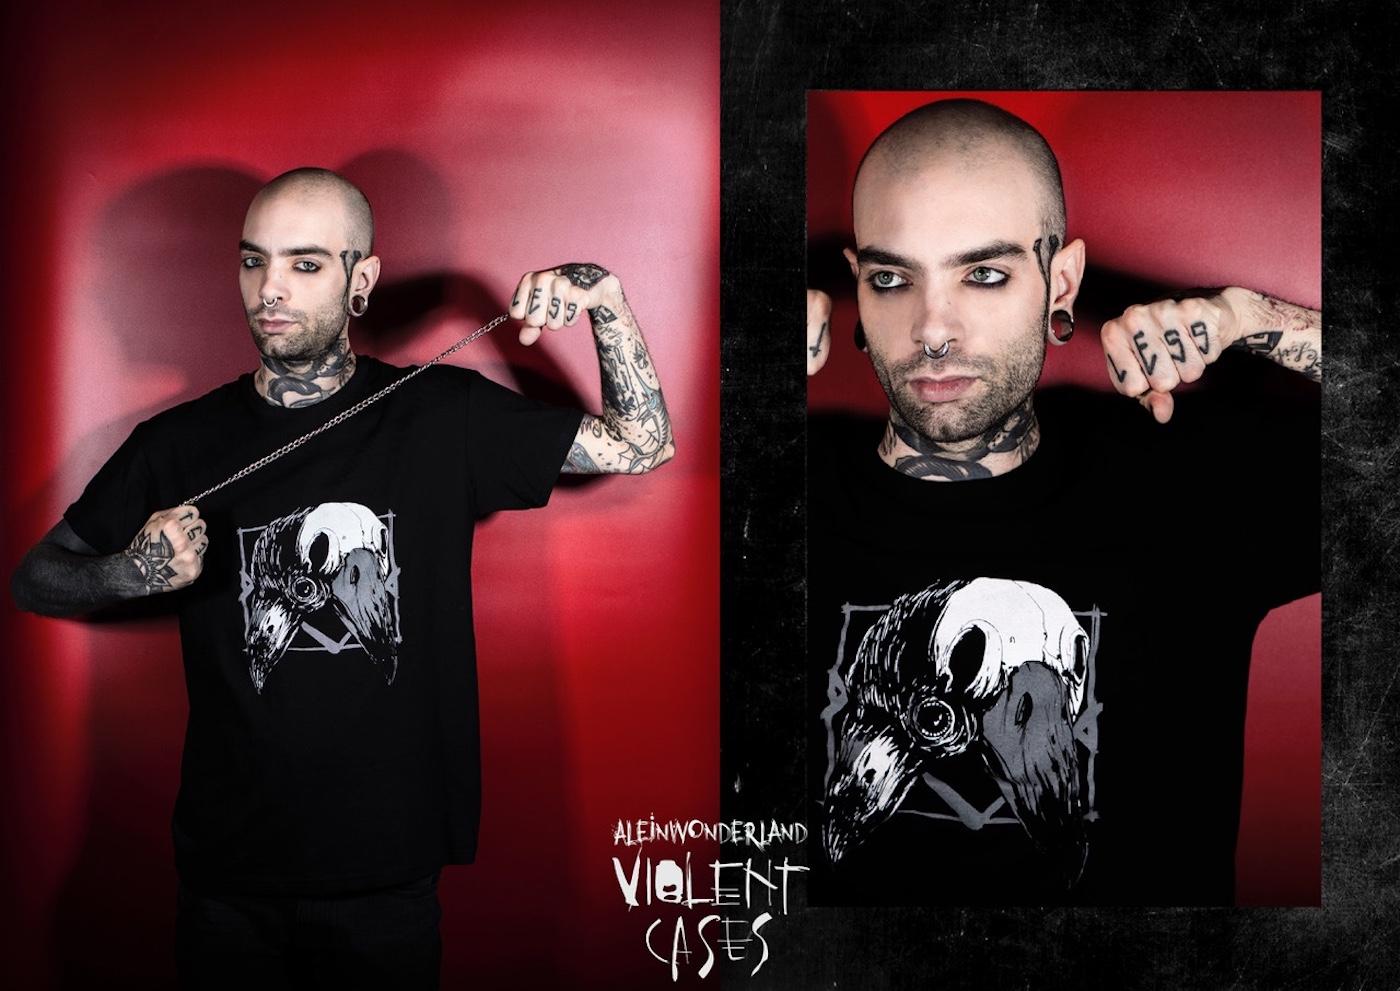 Mens_Shirt_Size_L